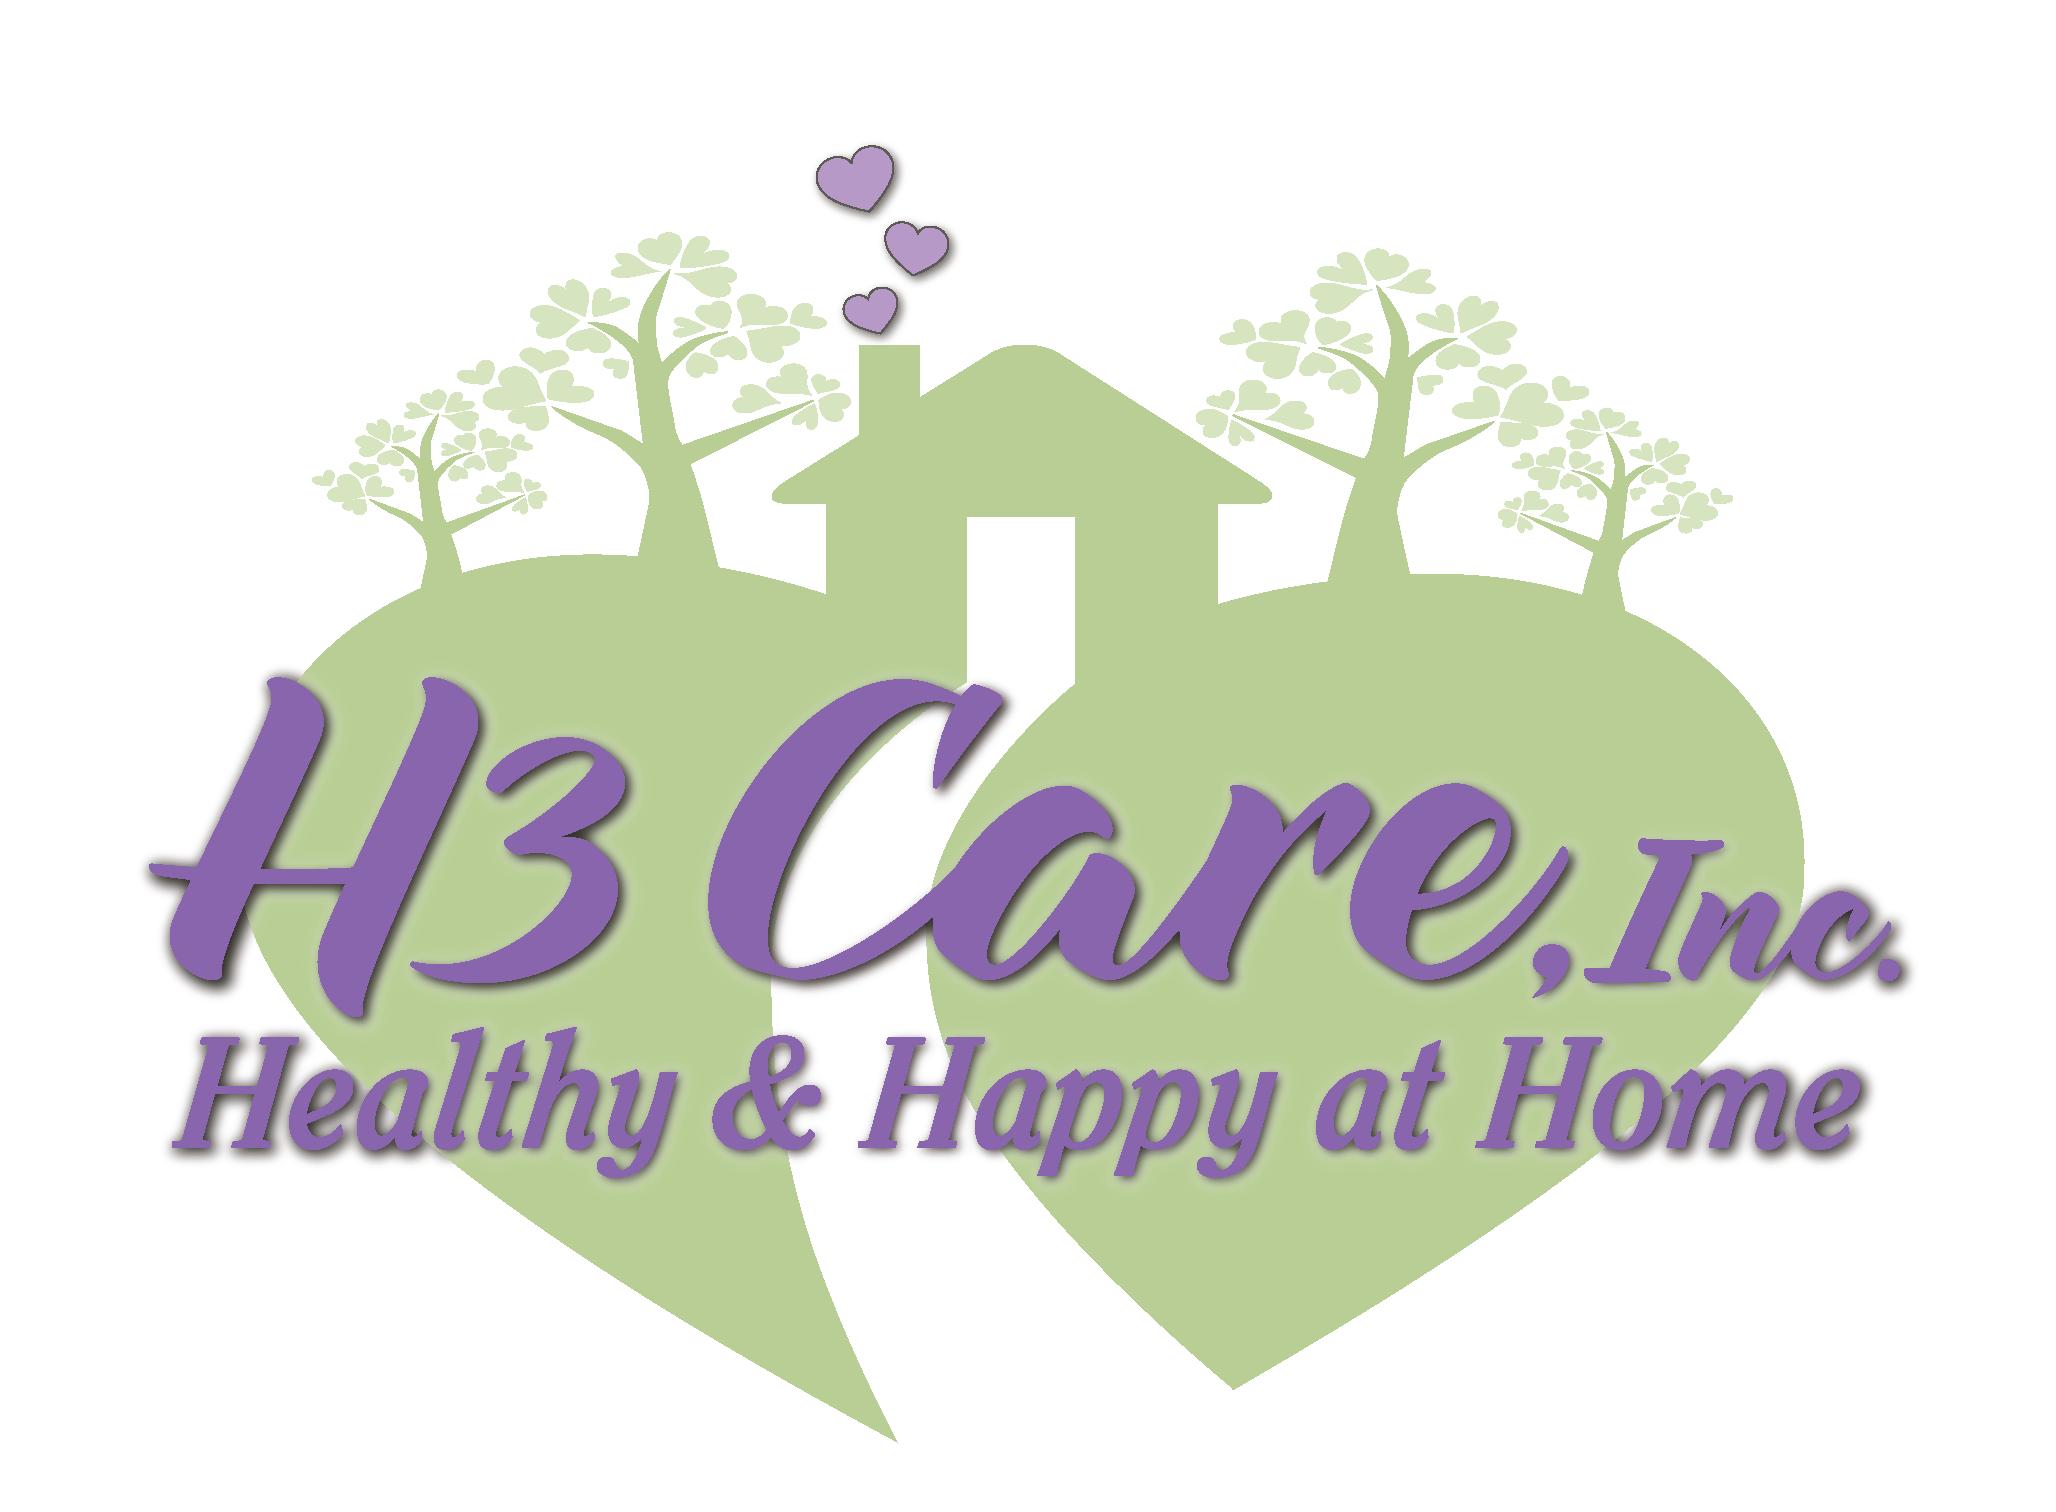 H3 Care, Inc